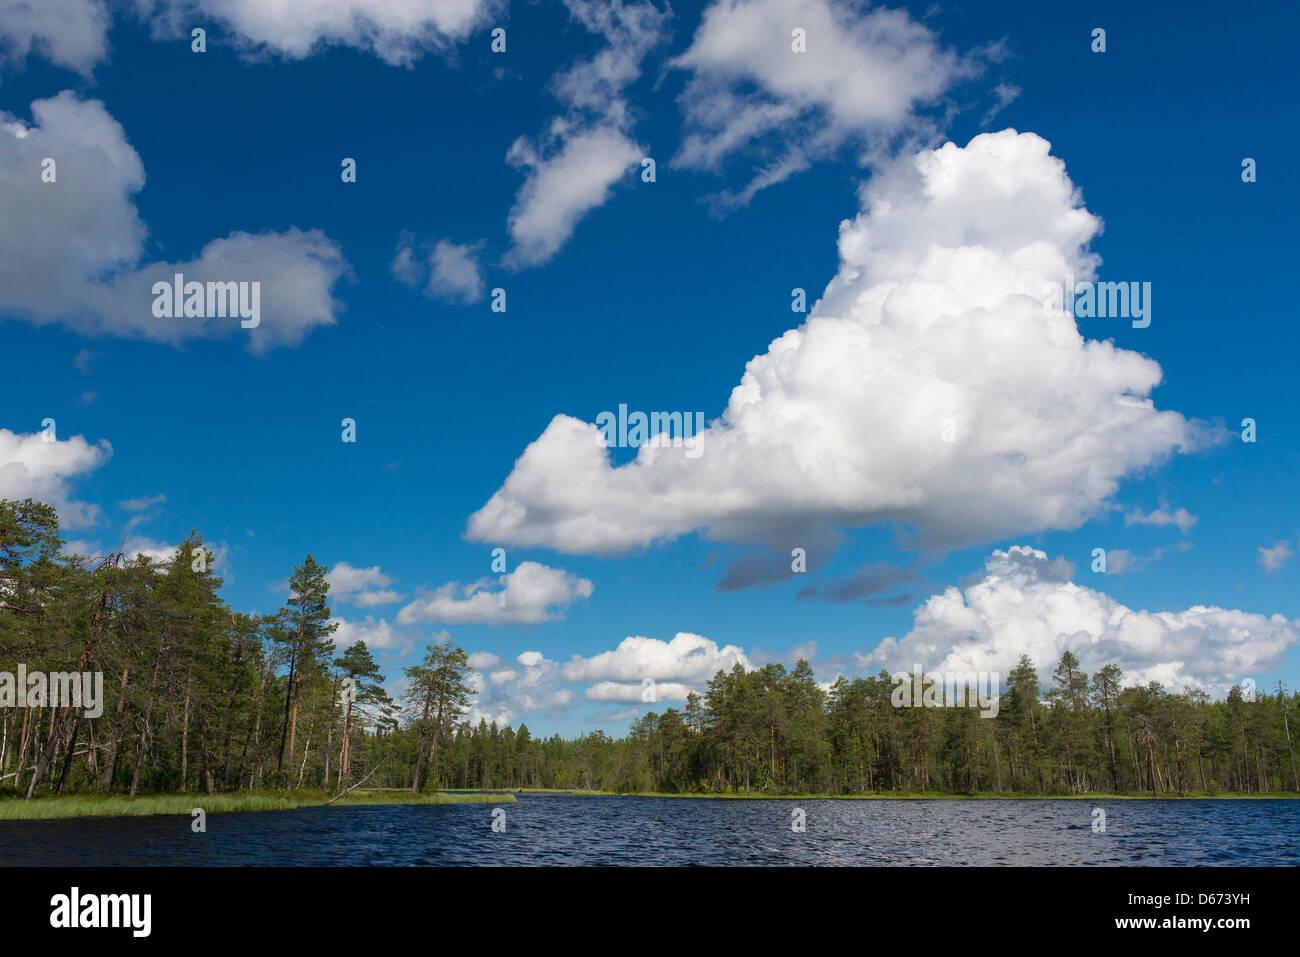 finnish landscape, finland - Stock Image